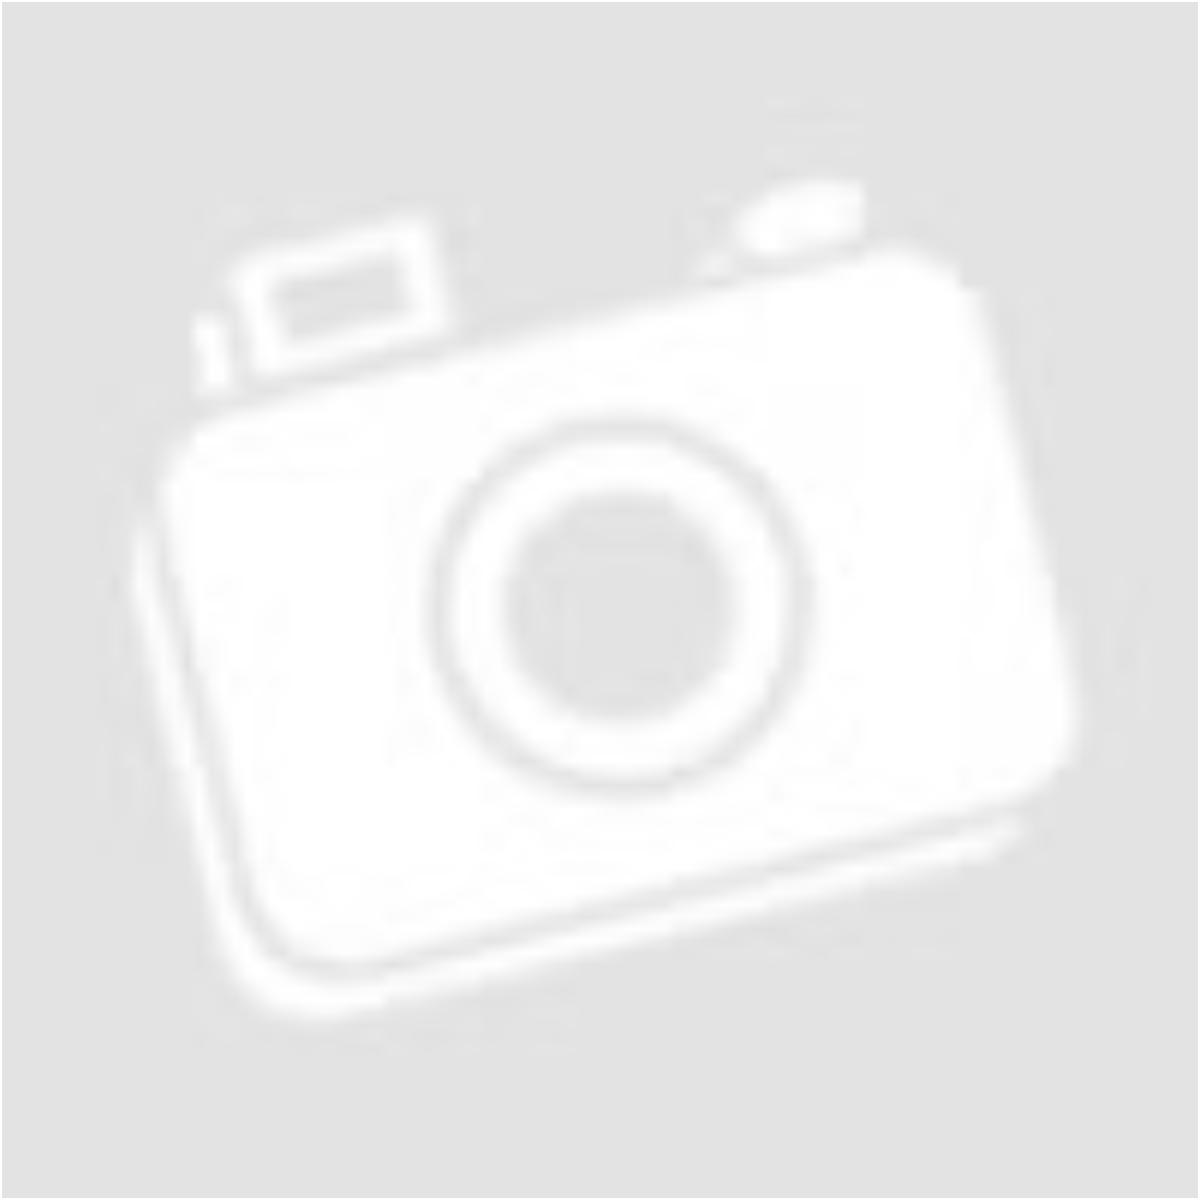 BIANCHI VIA NIRONE 7 DAMA BIANCA - SORA 9SP 50/34 kerékpár